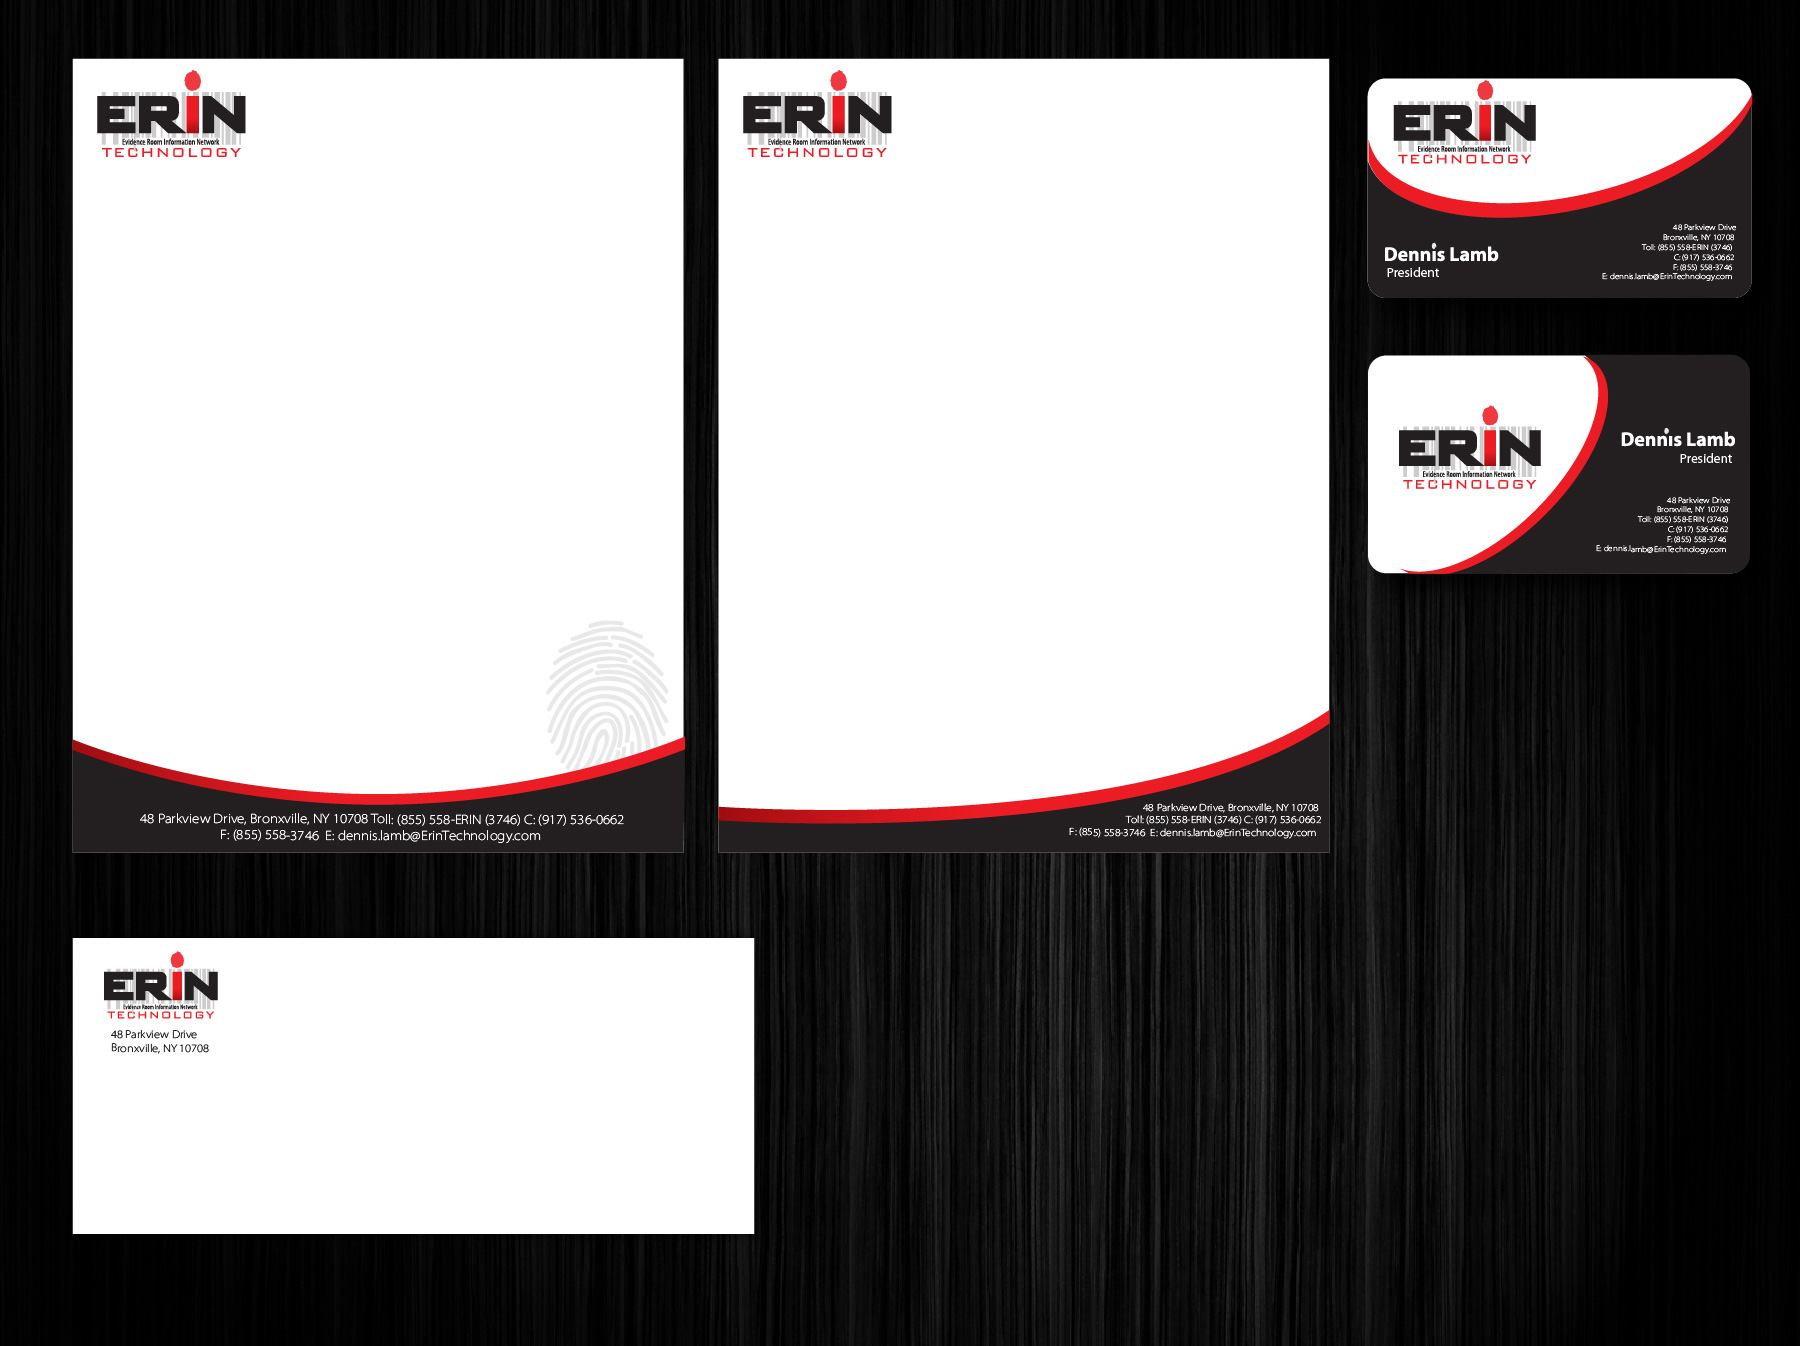 ... Technology business cards, letterhead, stationery by MycroBurst.com